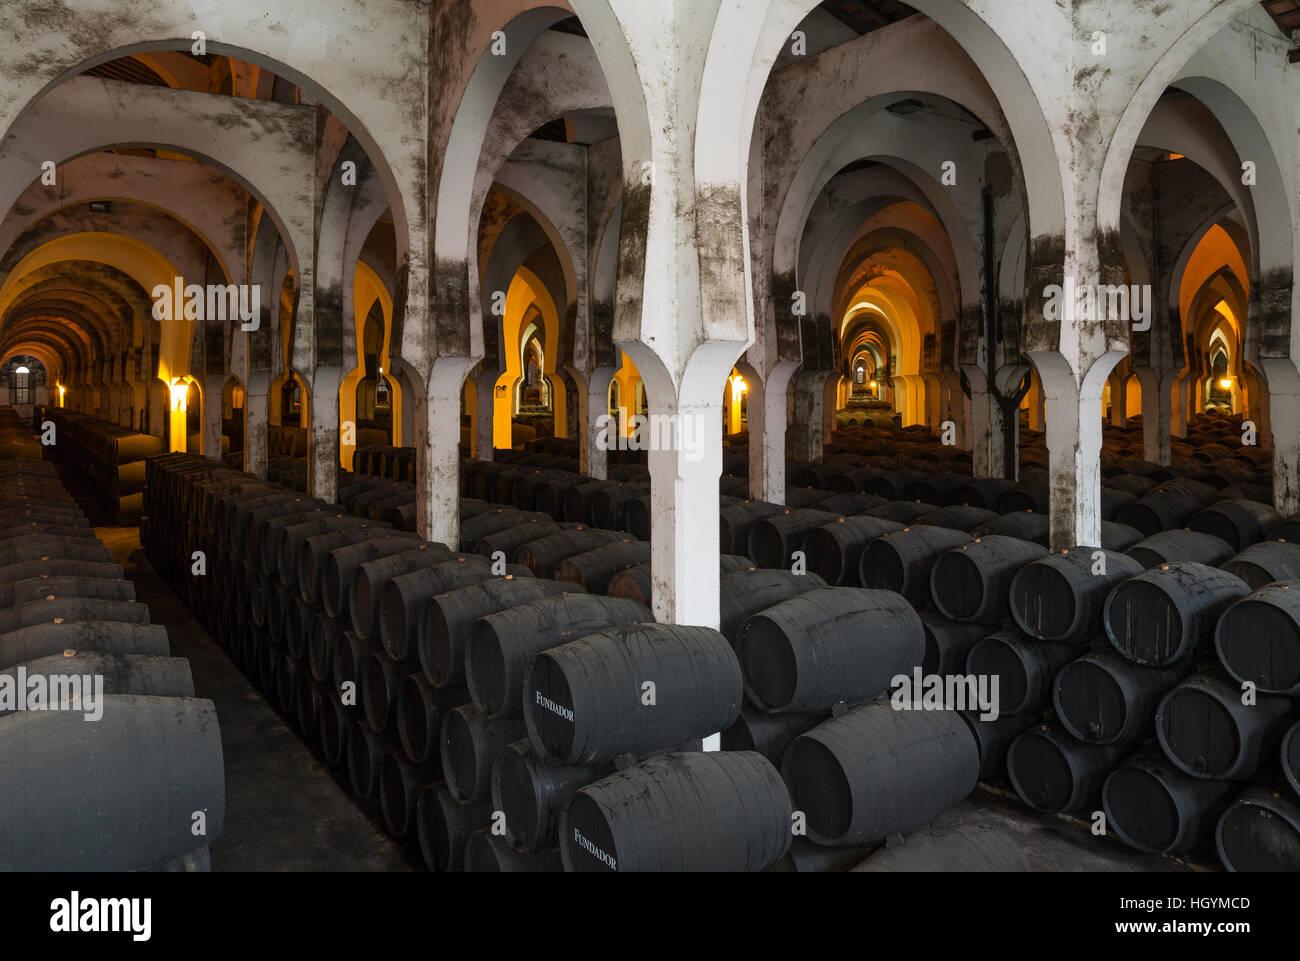 Eichenfässern im Weinkeller La Mezquita, Weingut Bodega Fundador Pedro Domecq, Jerez De La Frontera, Cadiz Stockbild